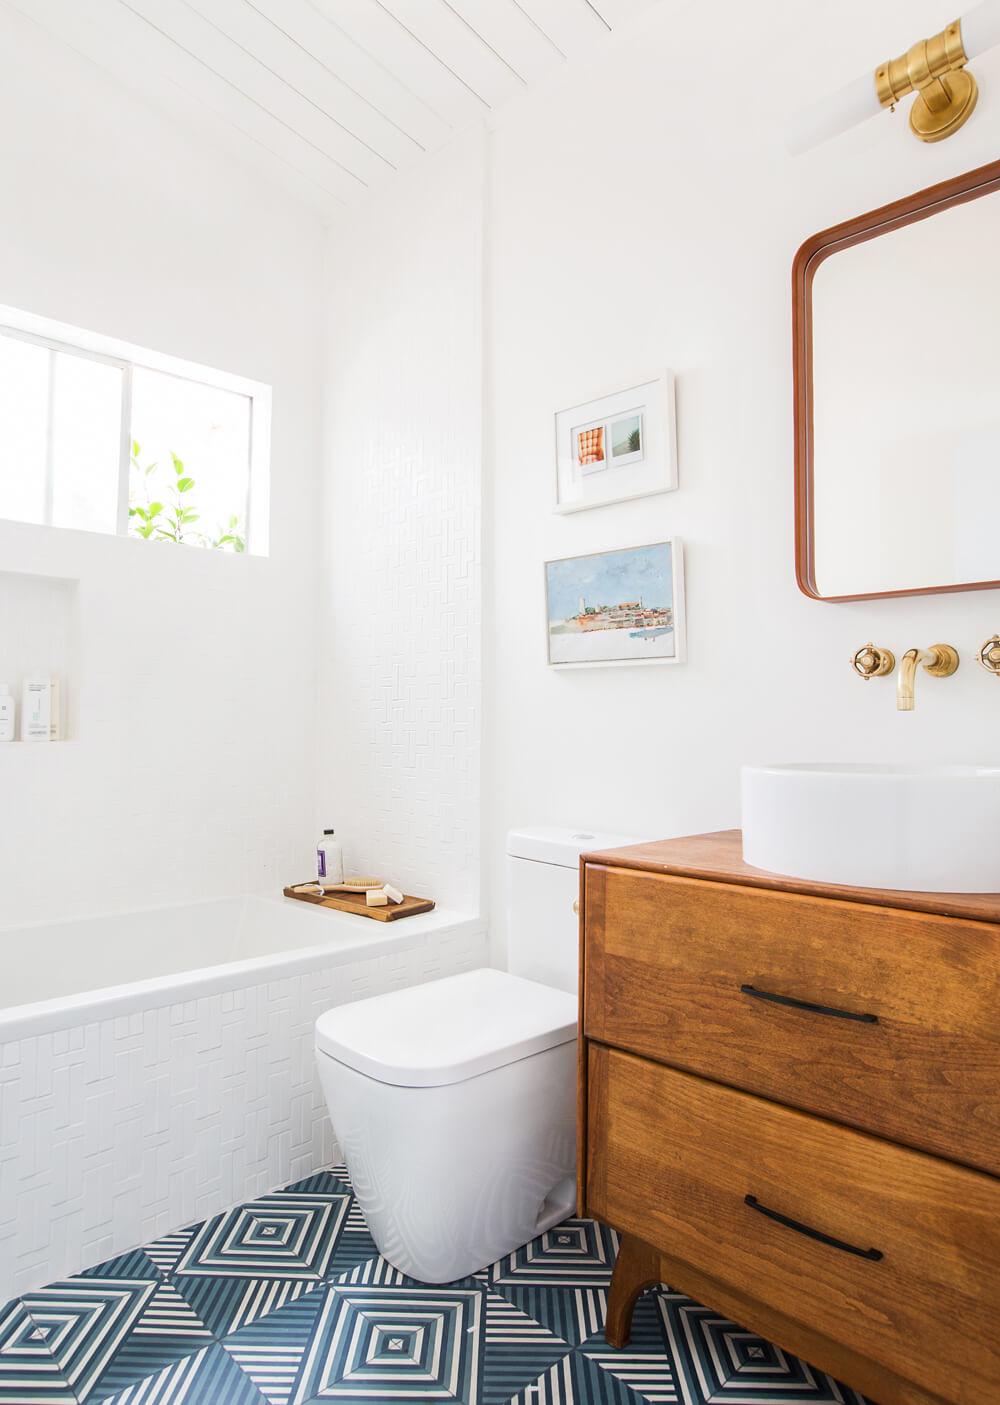 Mid Century Modern Bathroom | Blue Pattern Floor Tile | Clean White Bathroom Style | Beach House Bathroom